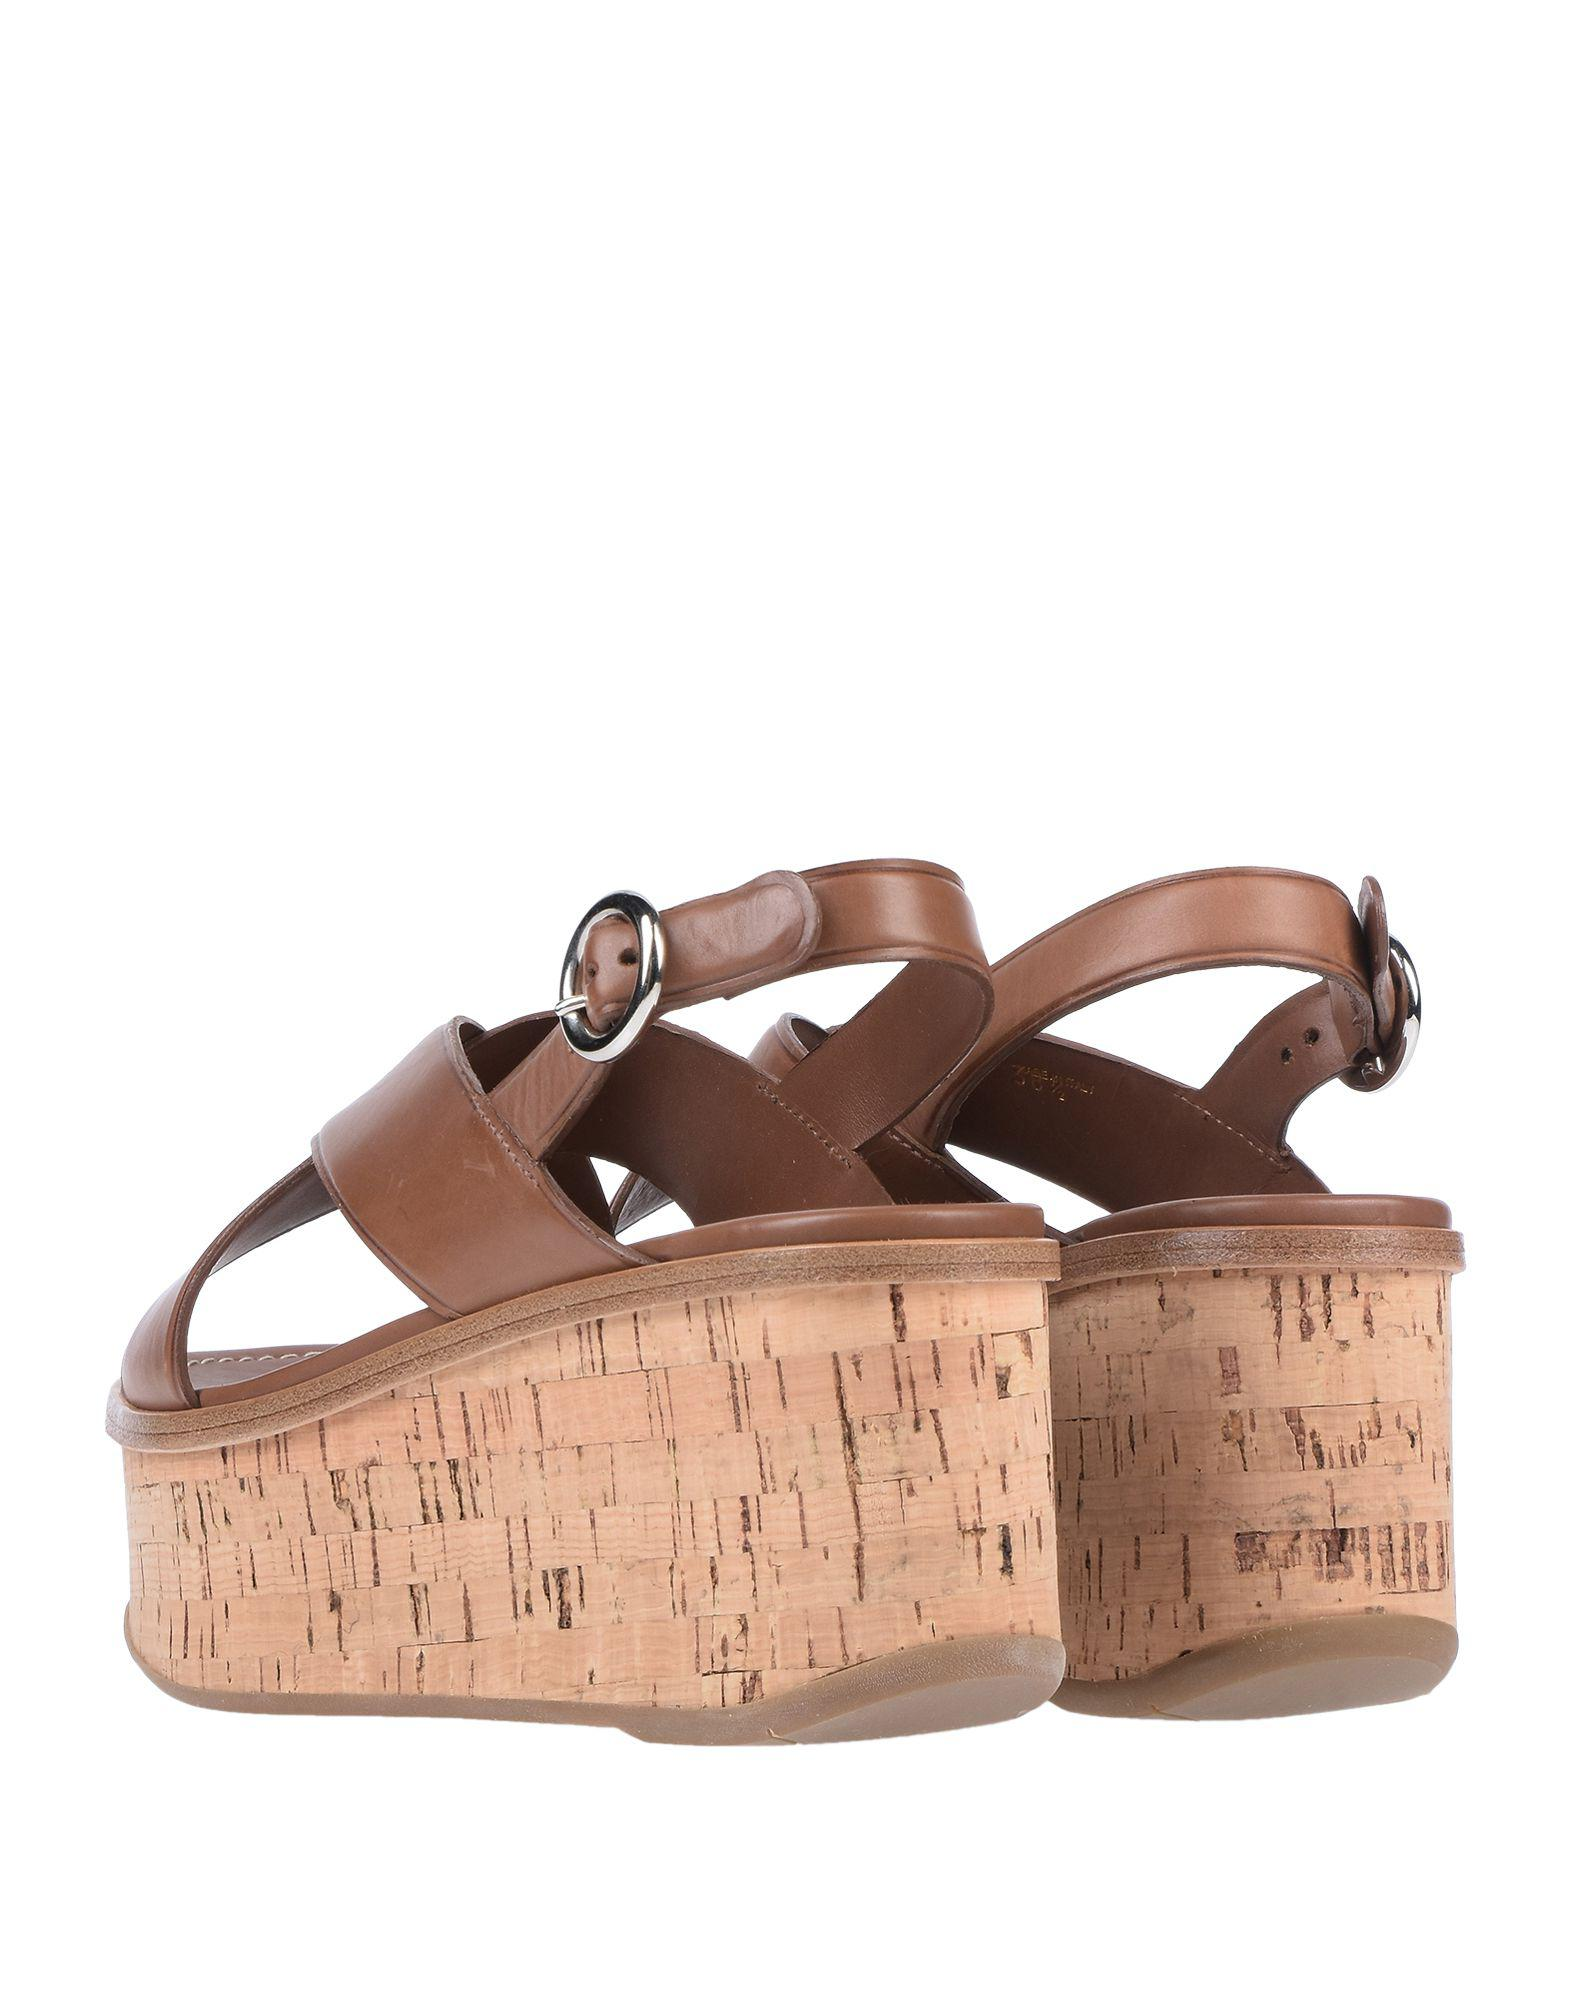 6be51dd5360 Lyst - Prada Sandals in Natural